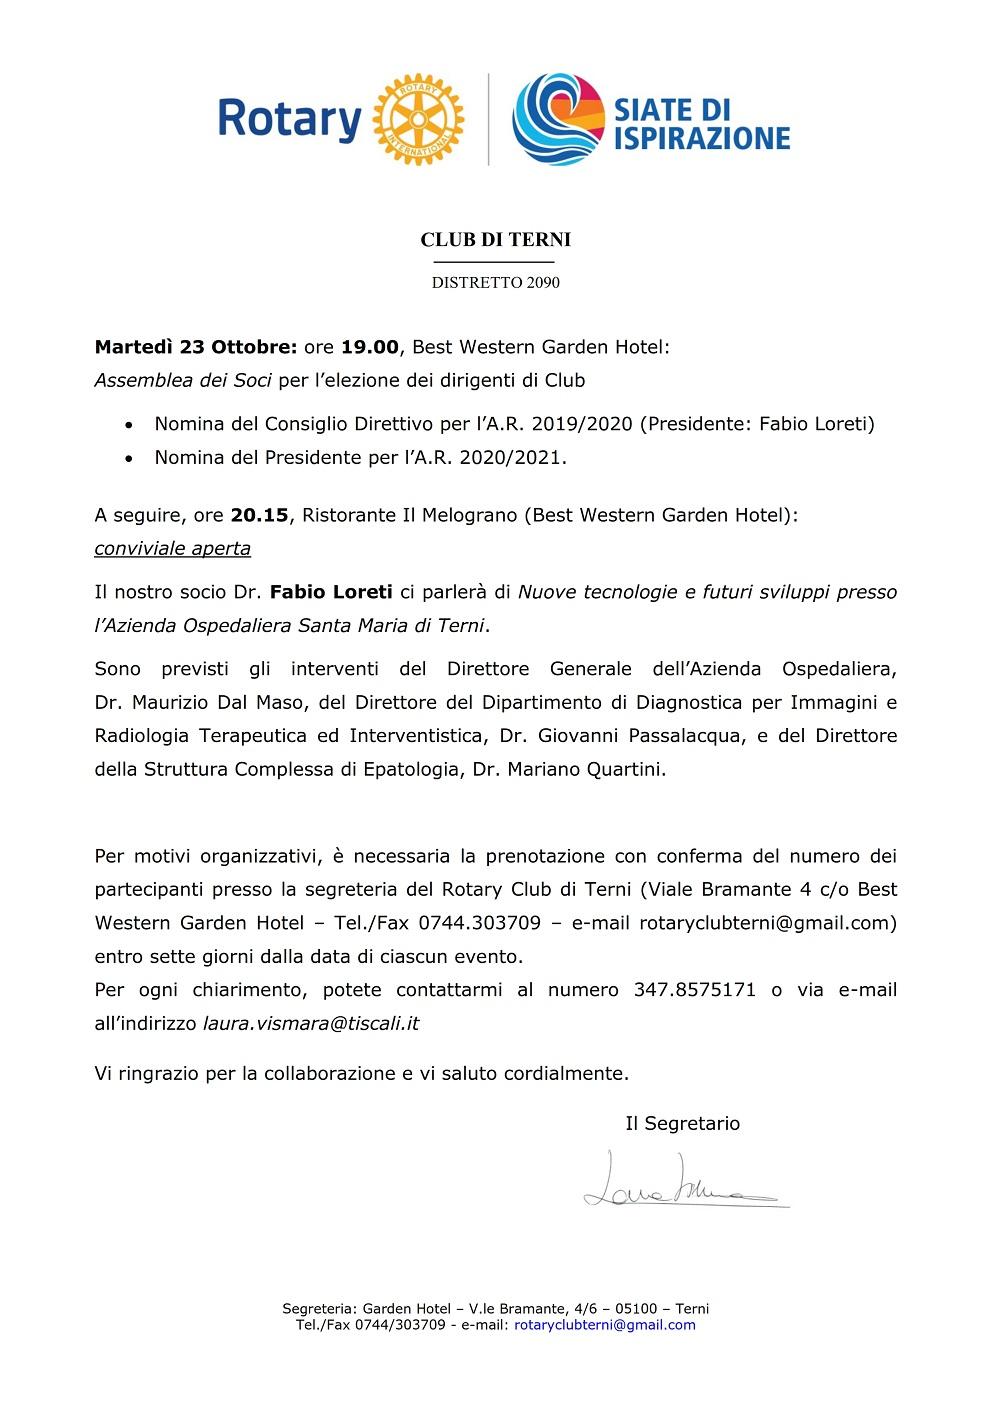 2018_10-RC Terni-Programma Ottobre 2018_002